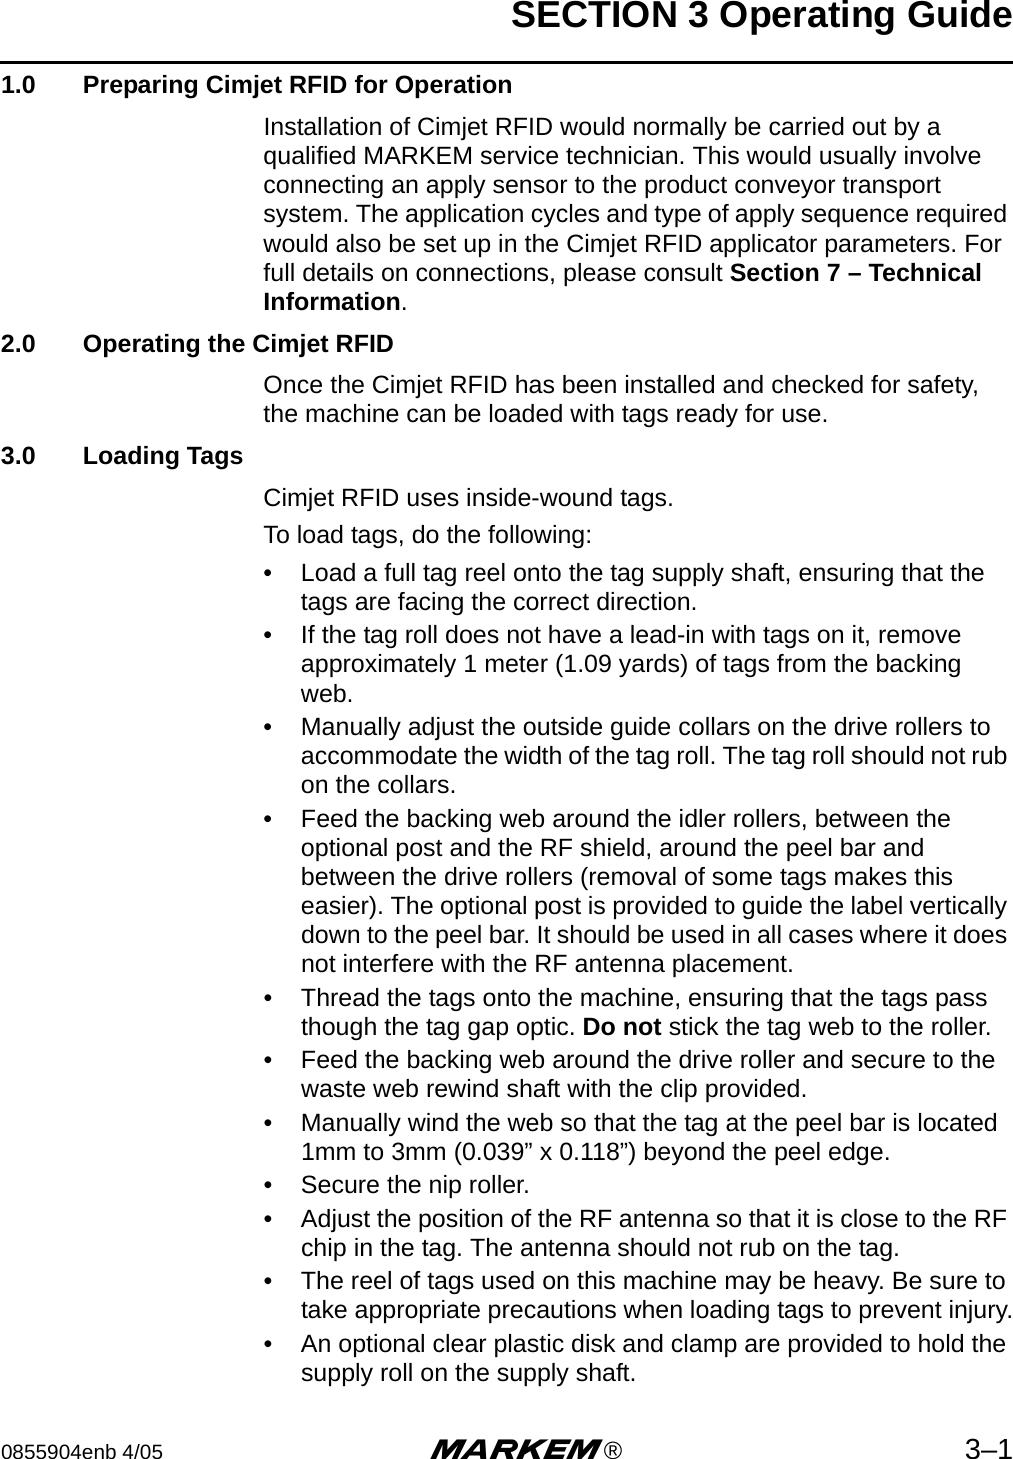 markem smartdate 3 user manual